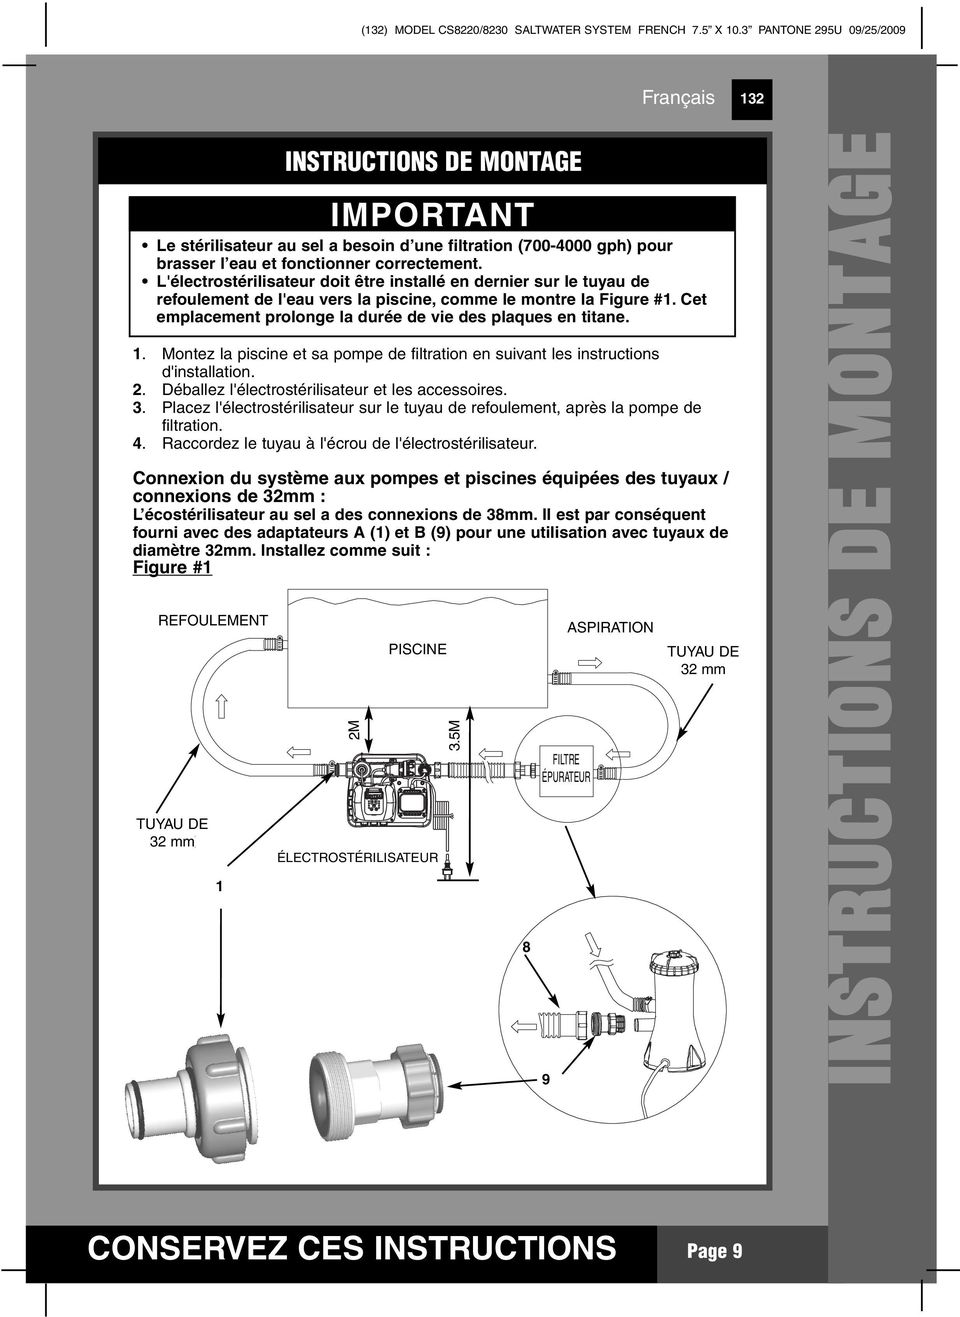 electrolyseur intex code 91